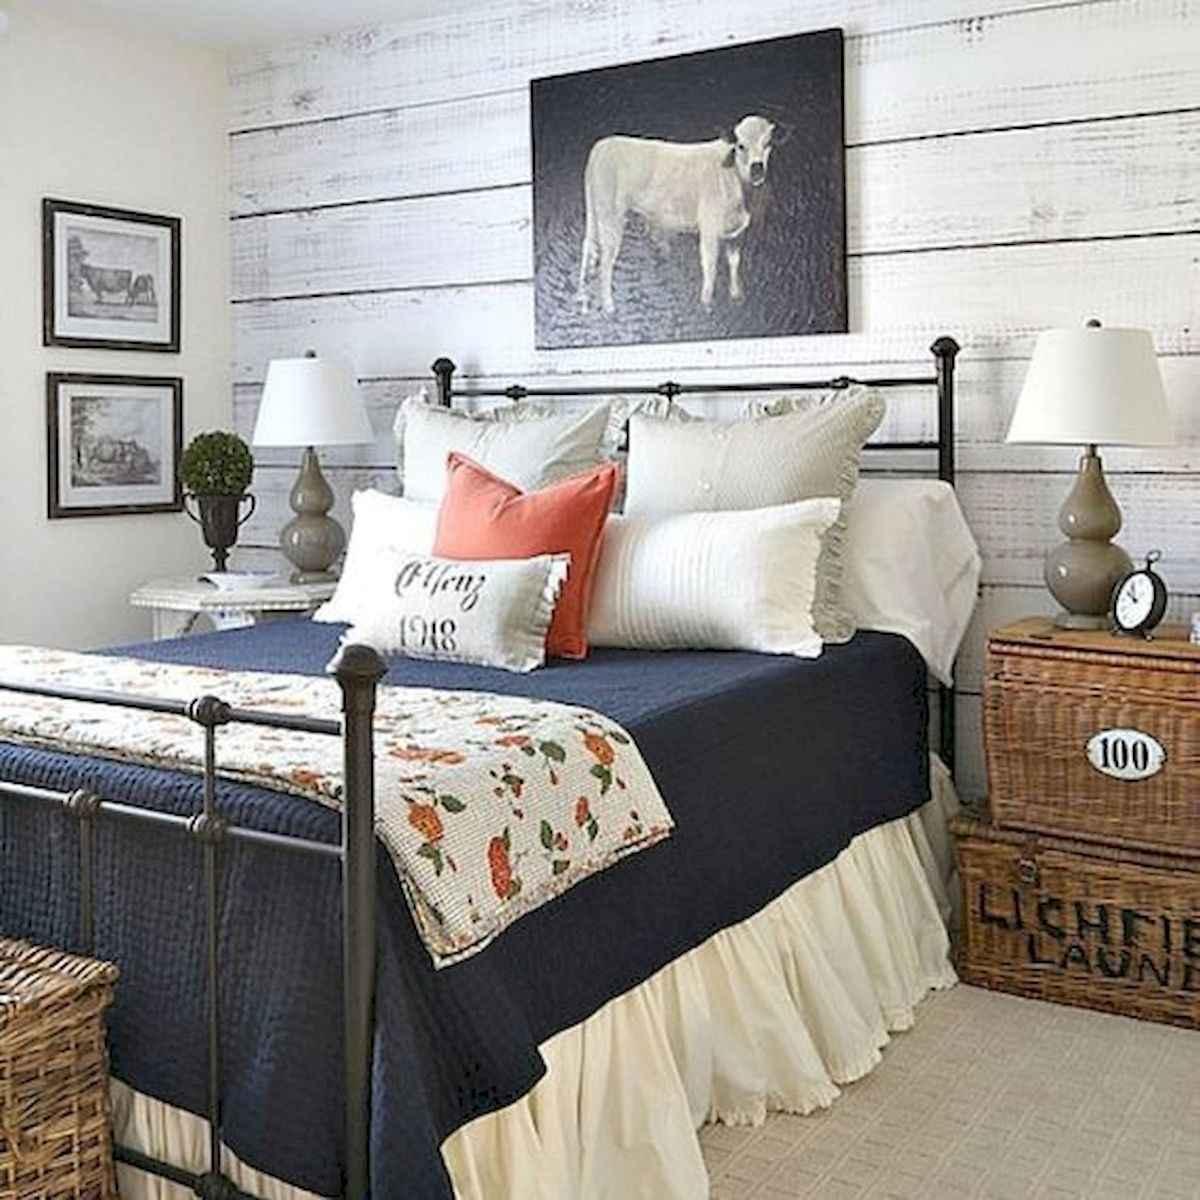 50 Favorite Bedding for Farmhouse Bedroom Design Ideas and Decor (11)